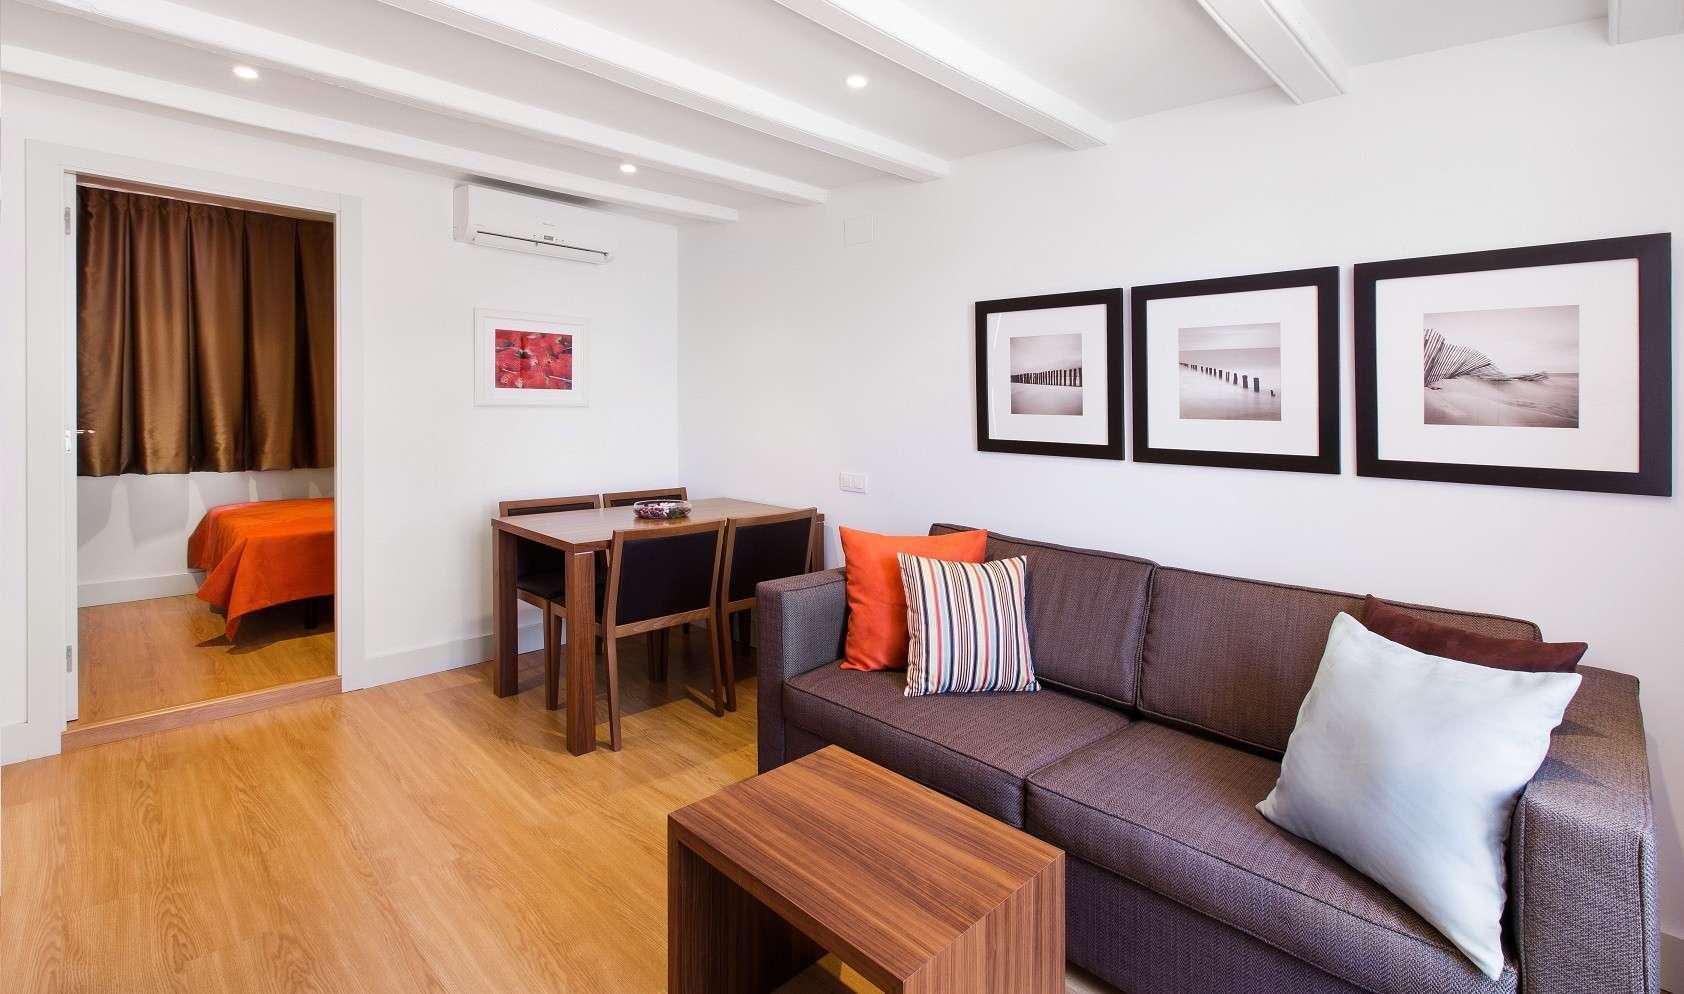 Dailyflats Sagrada Familia 1-bedroom (1-4 adults) Attic apartment in Barcelona 1